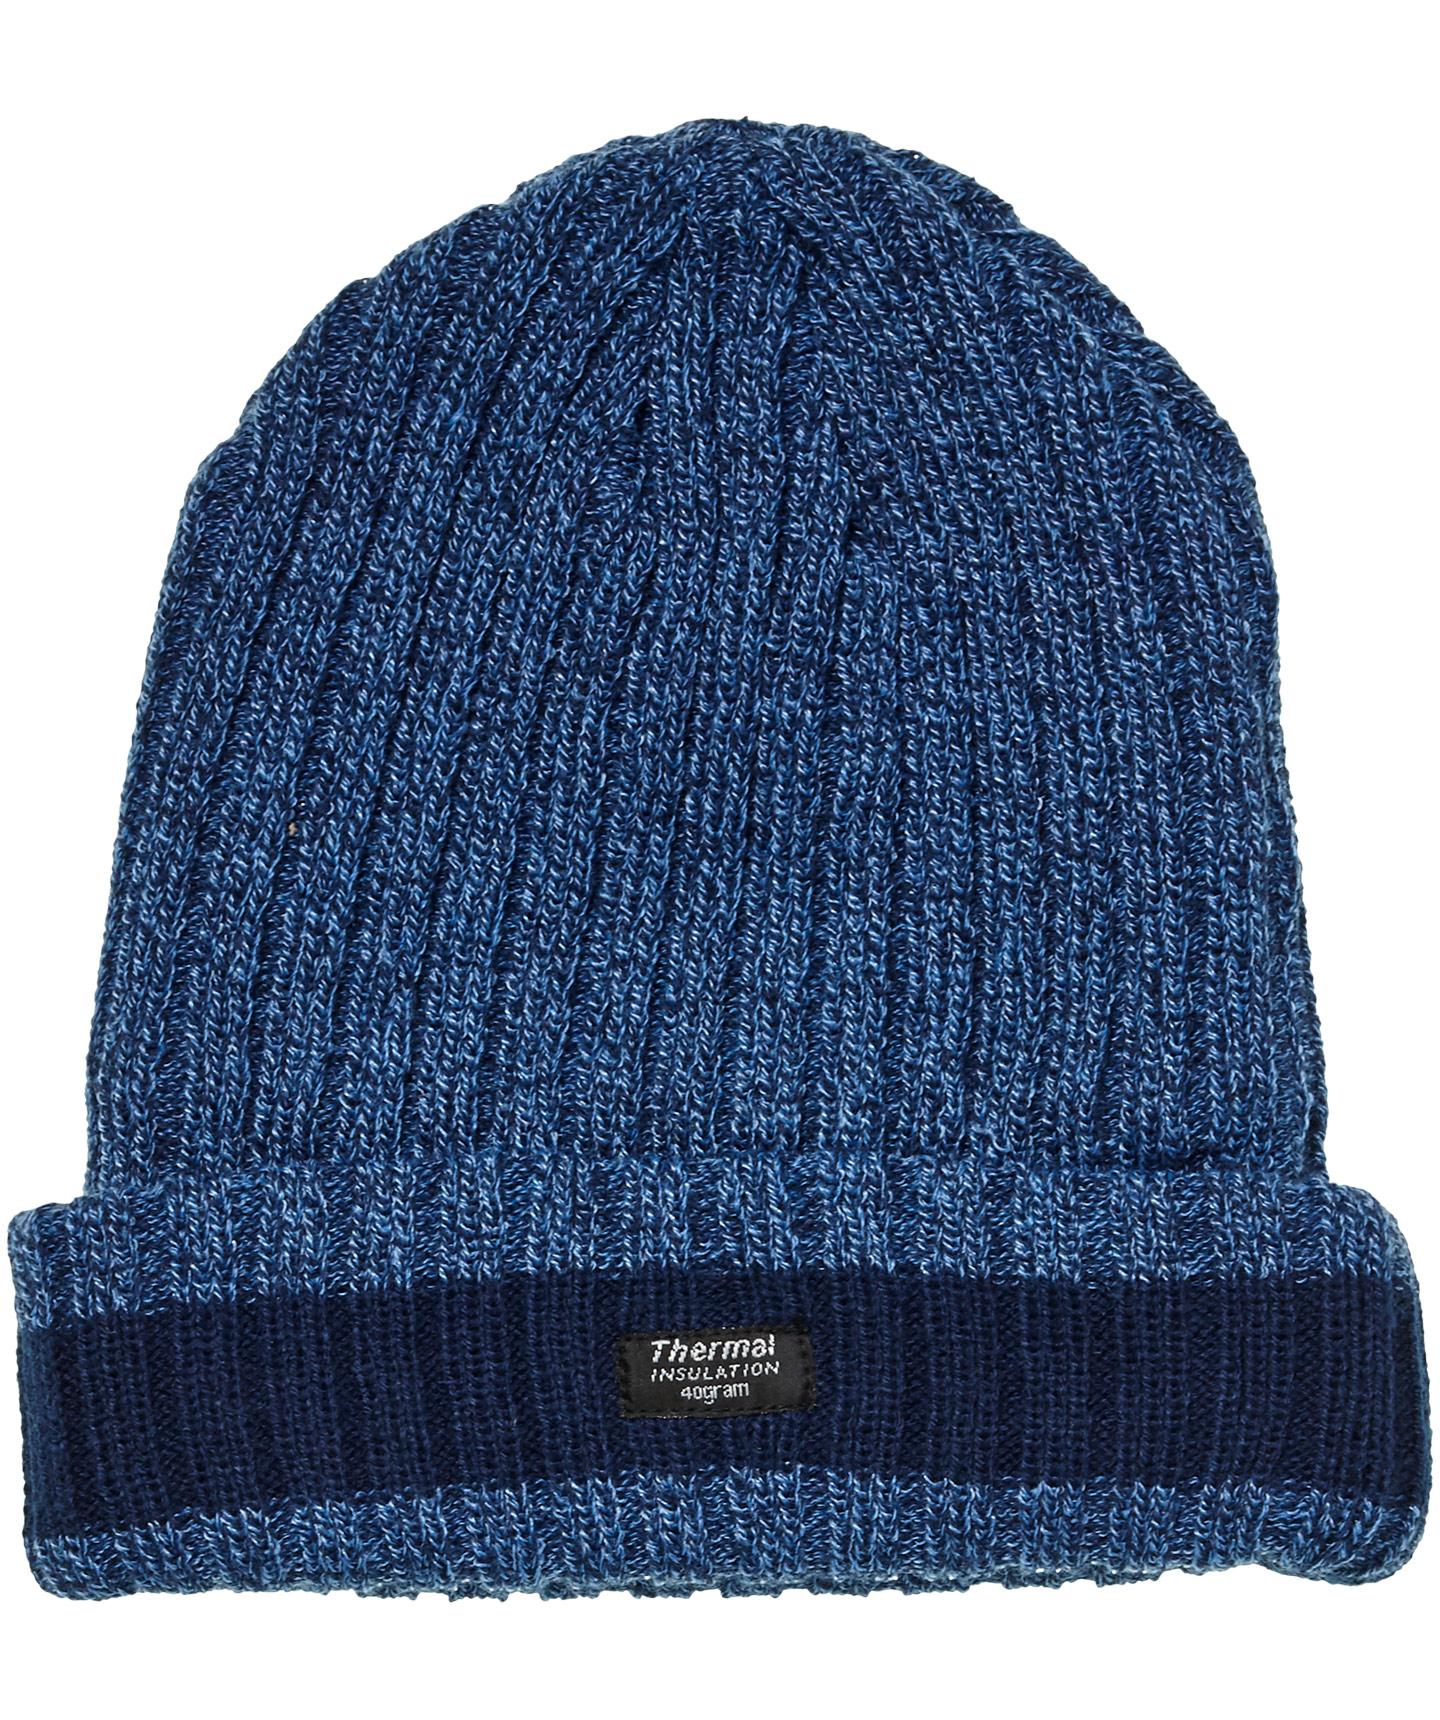 Fiebig Muts - Blauw